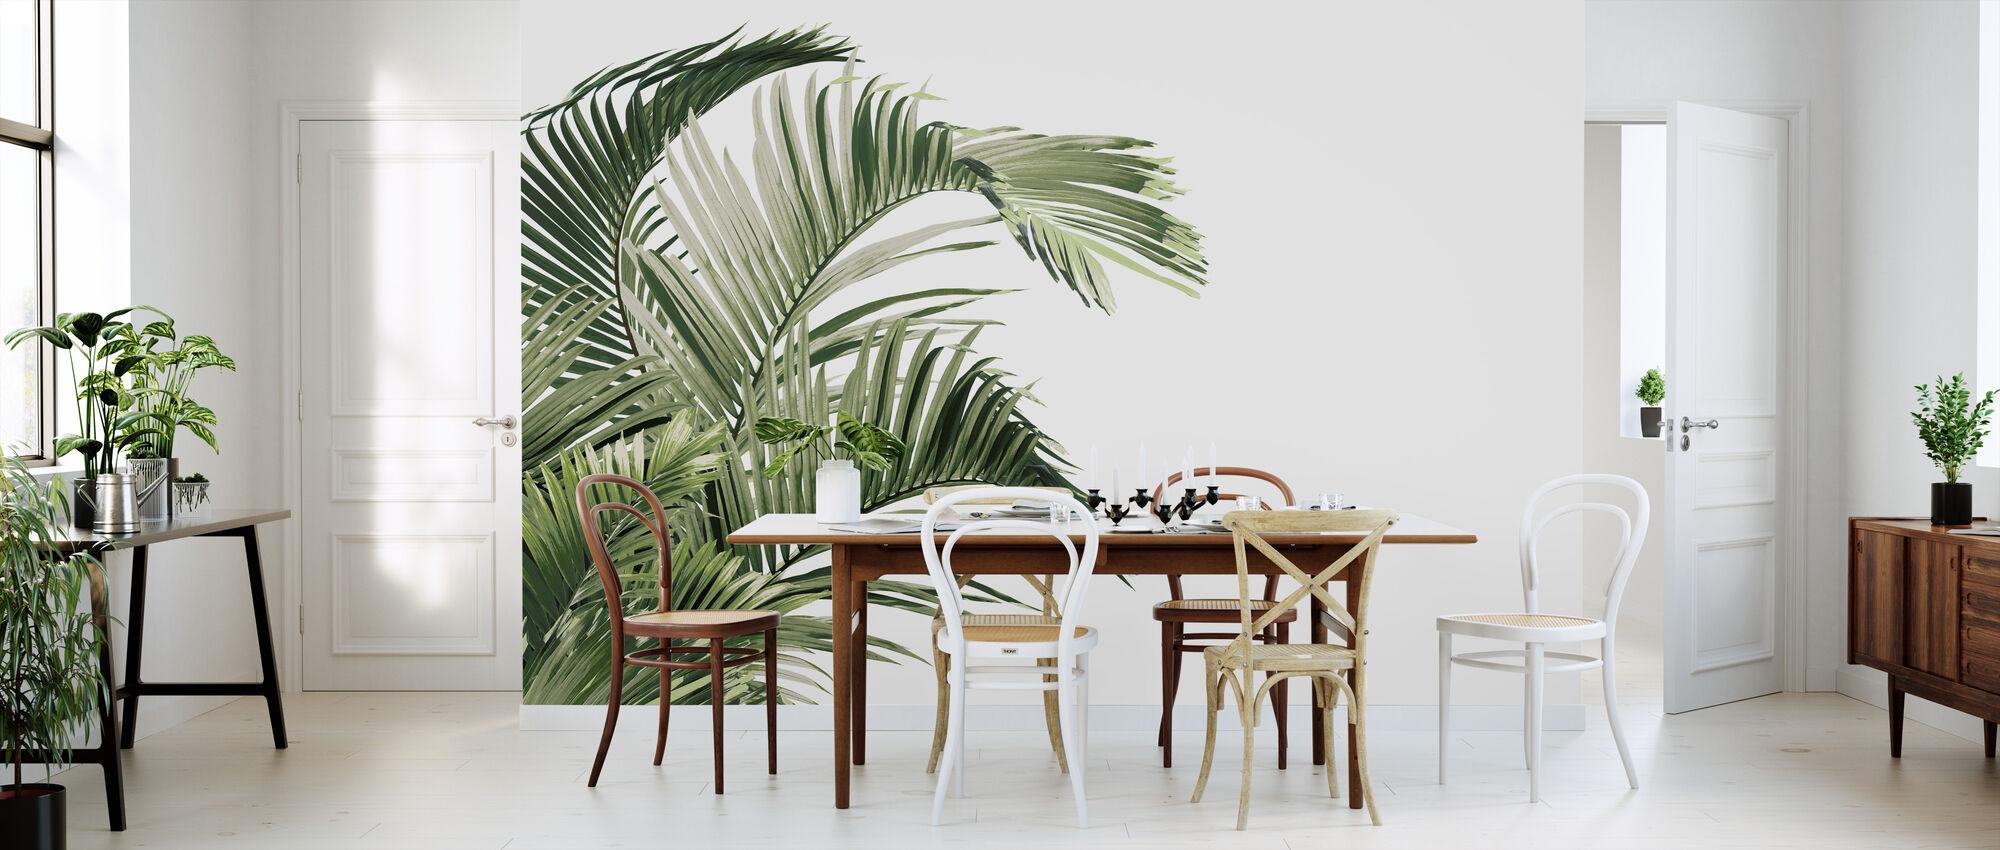 Piece of Paradise - Viridescent - Wallpaper - Kitchen